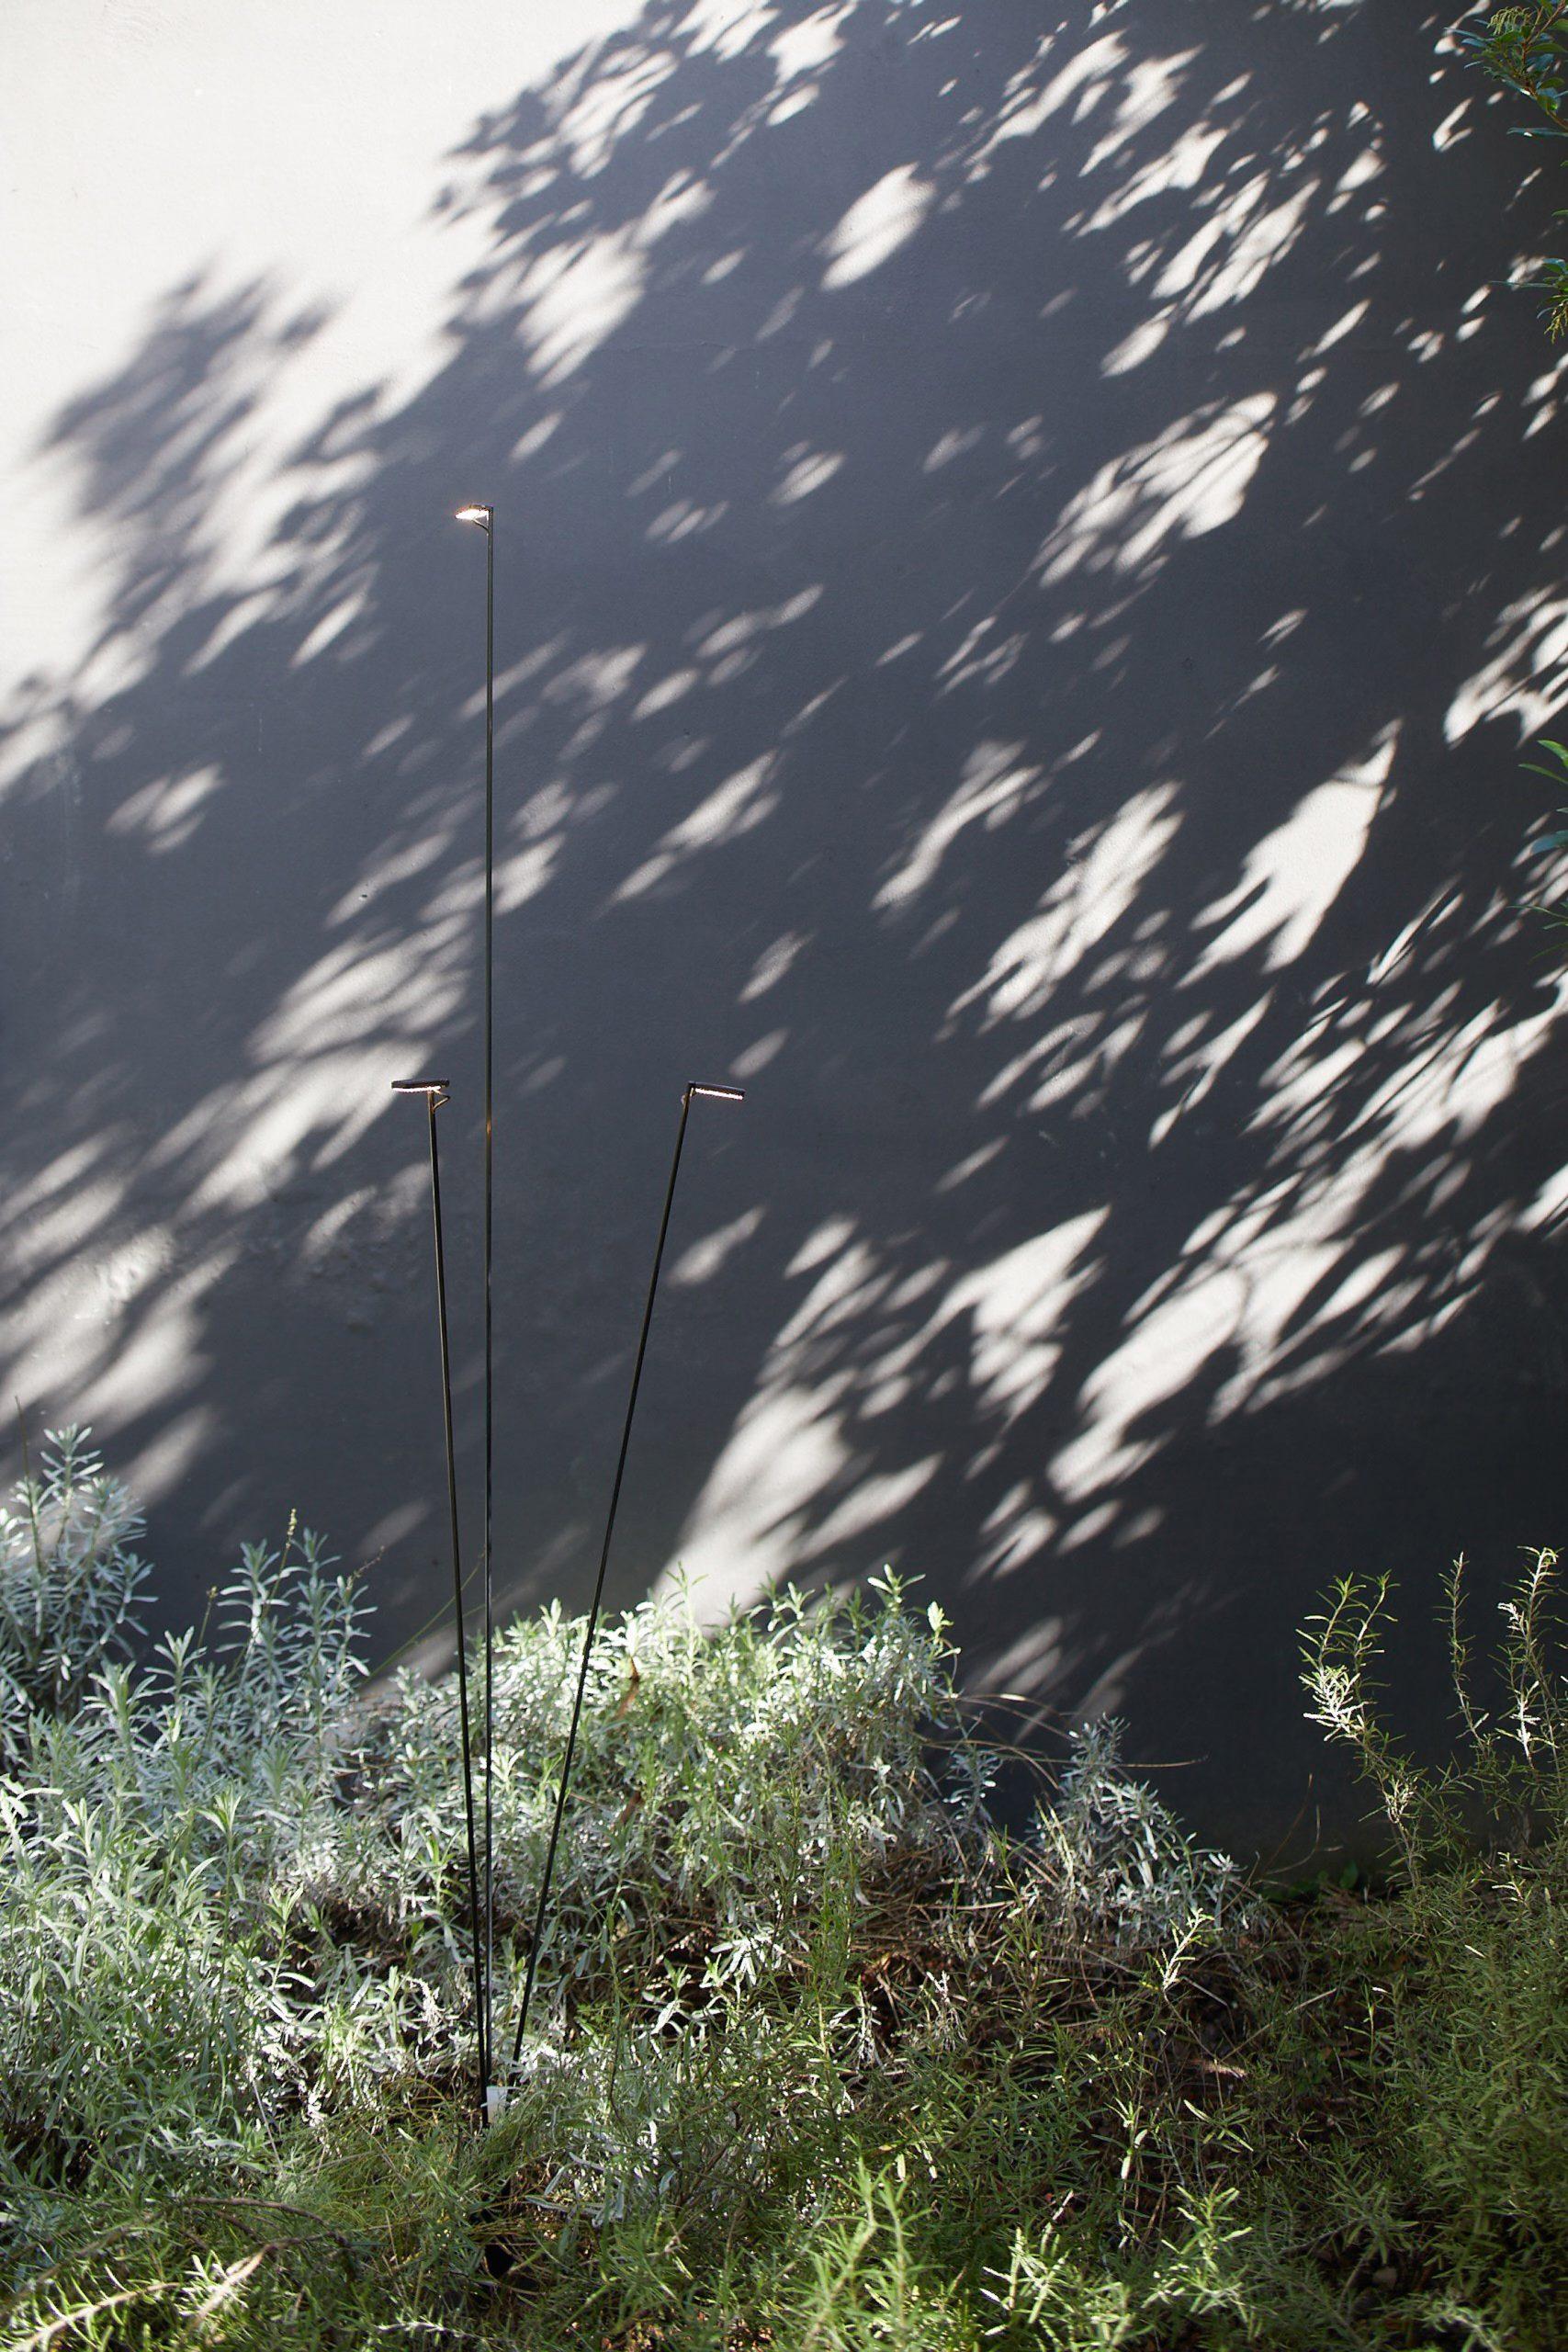 Three-headed Flia light in an exterior setting